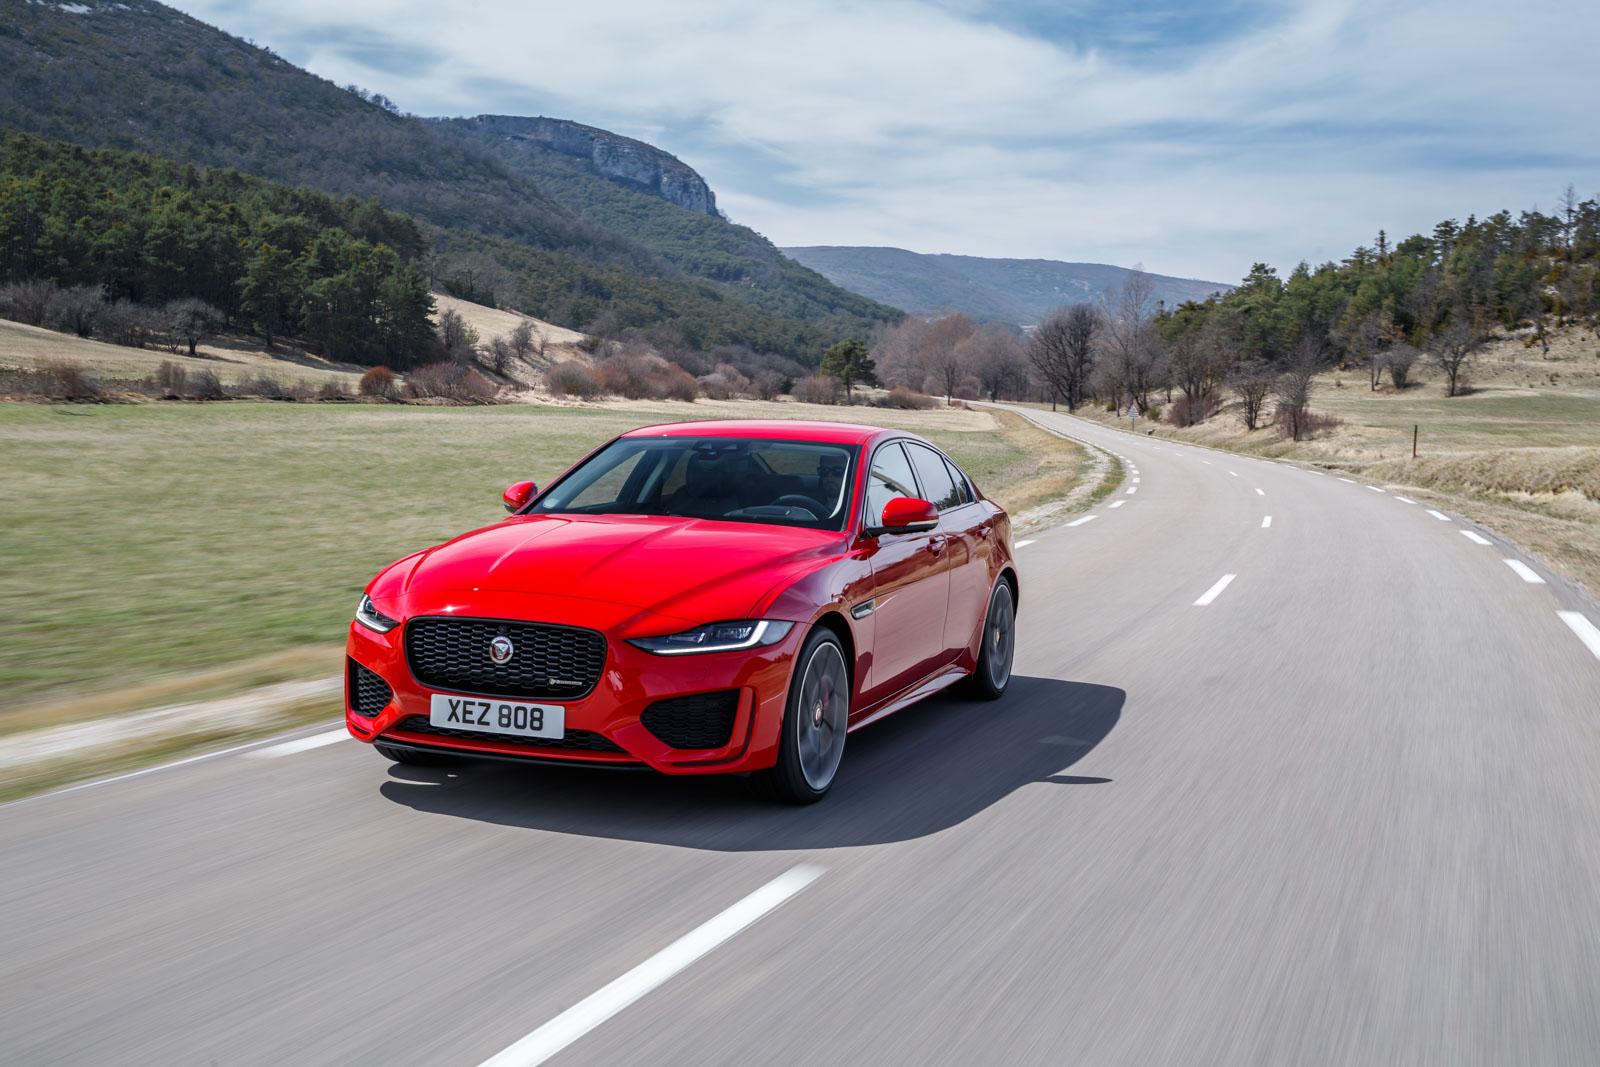 Jaguar-XE-2019-001.jpg